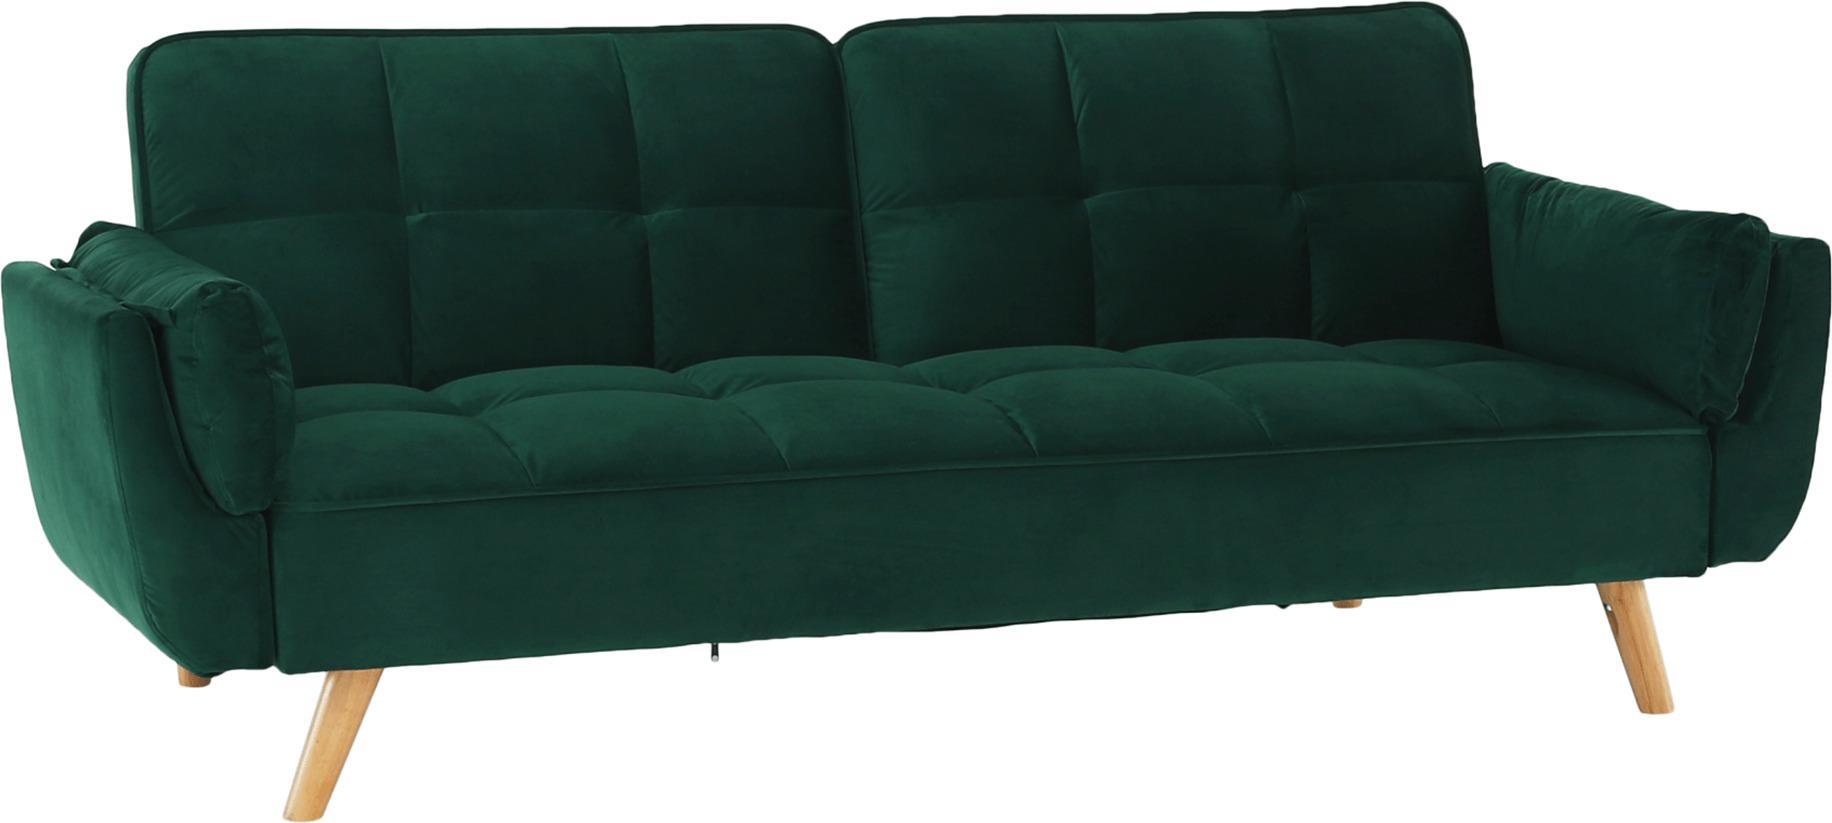 Rozkladacia pohovka, smaragdový zamat/buk, KAPRERA NEW